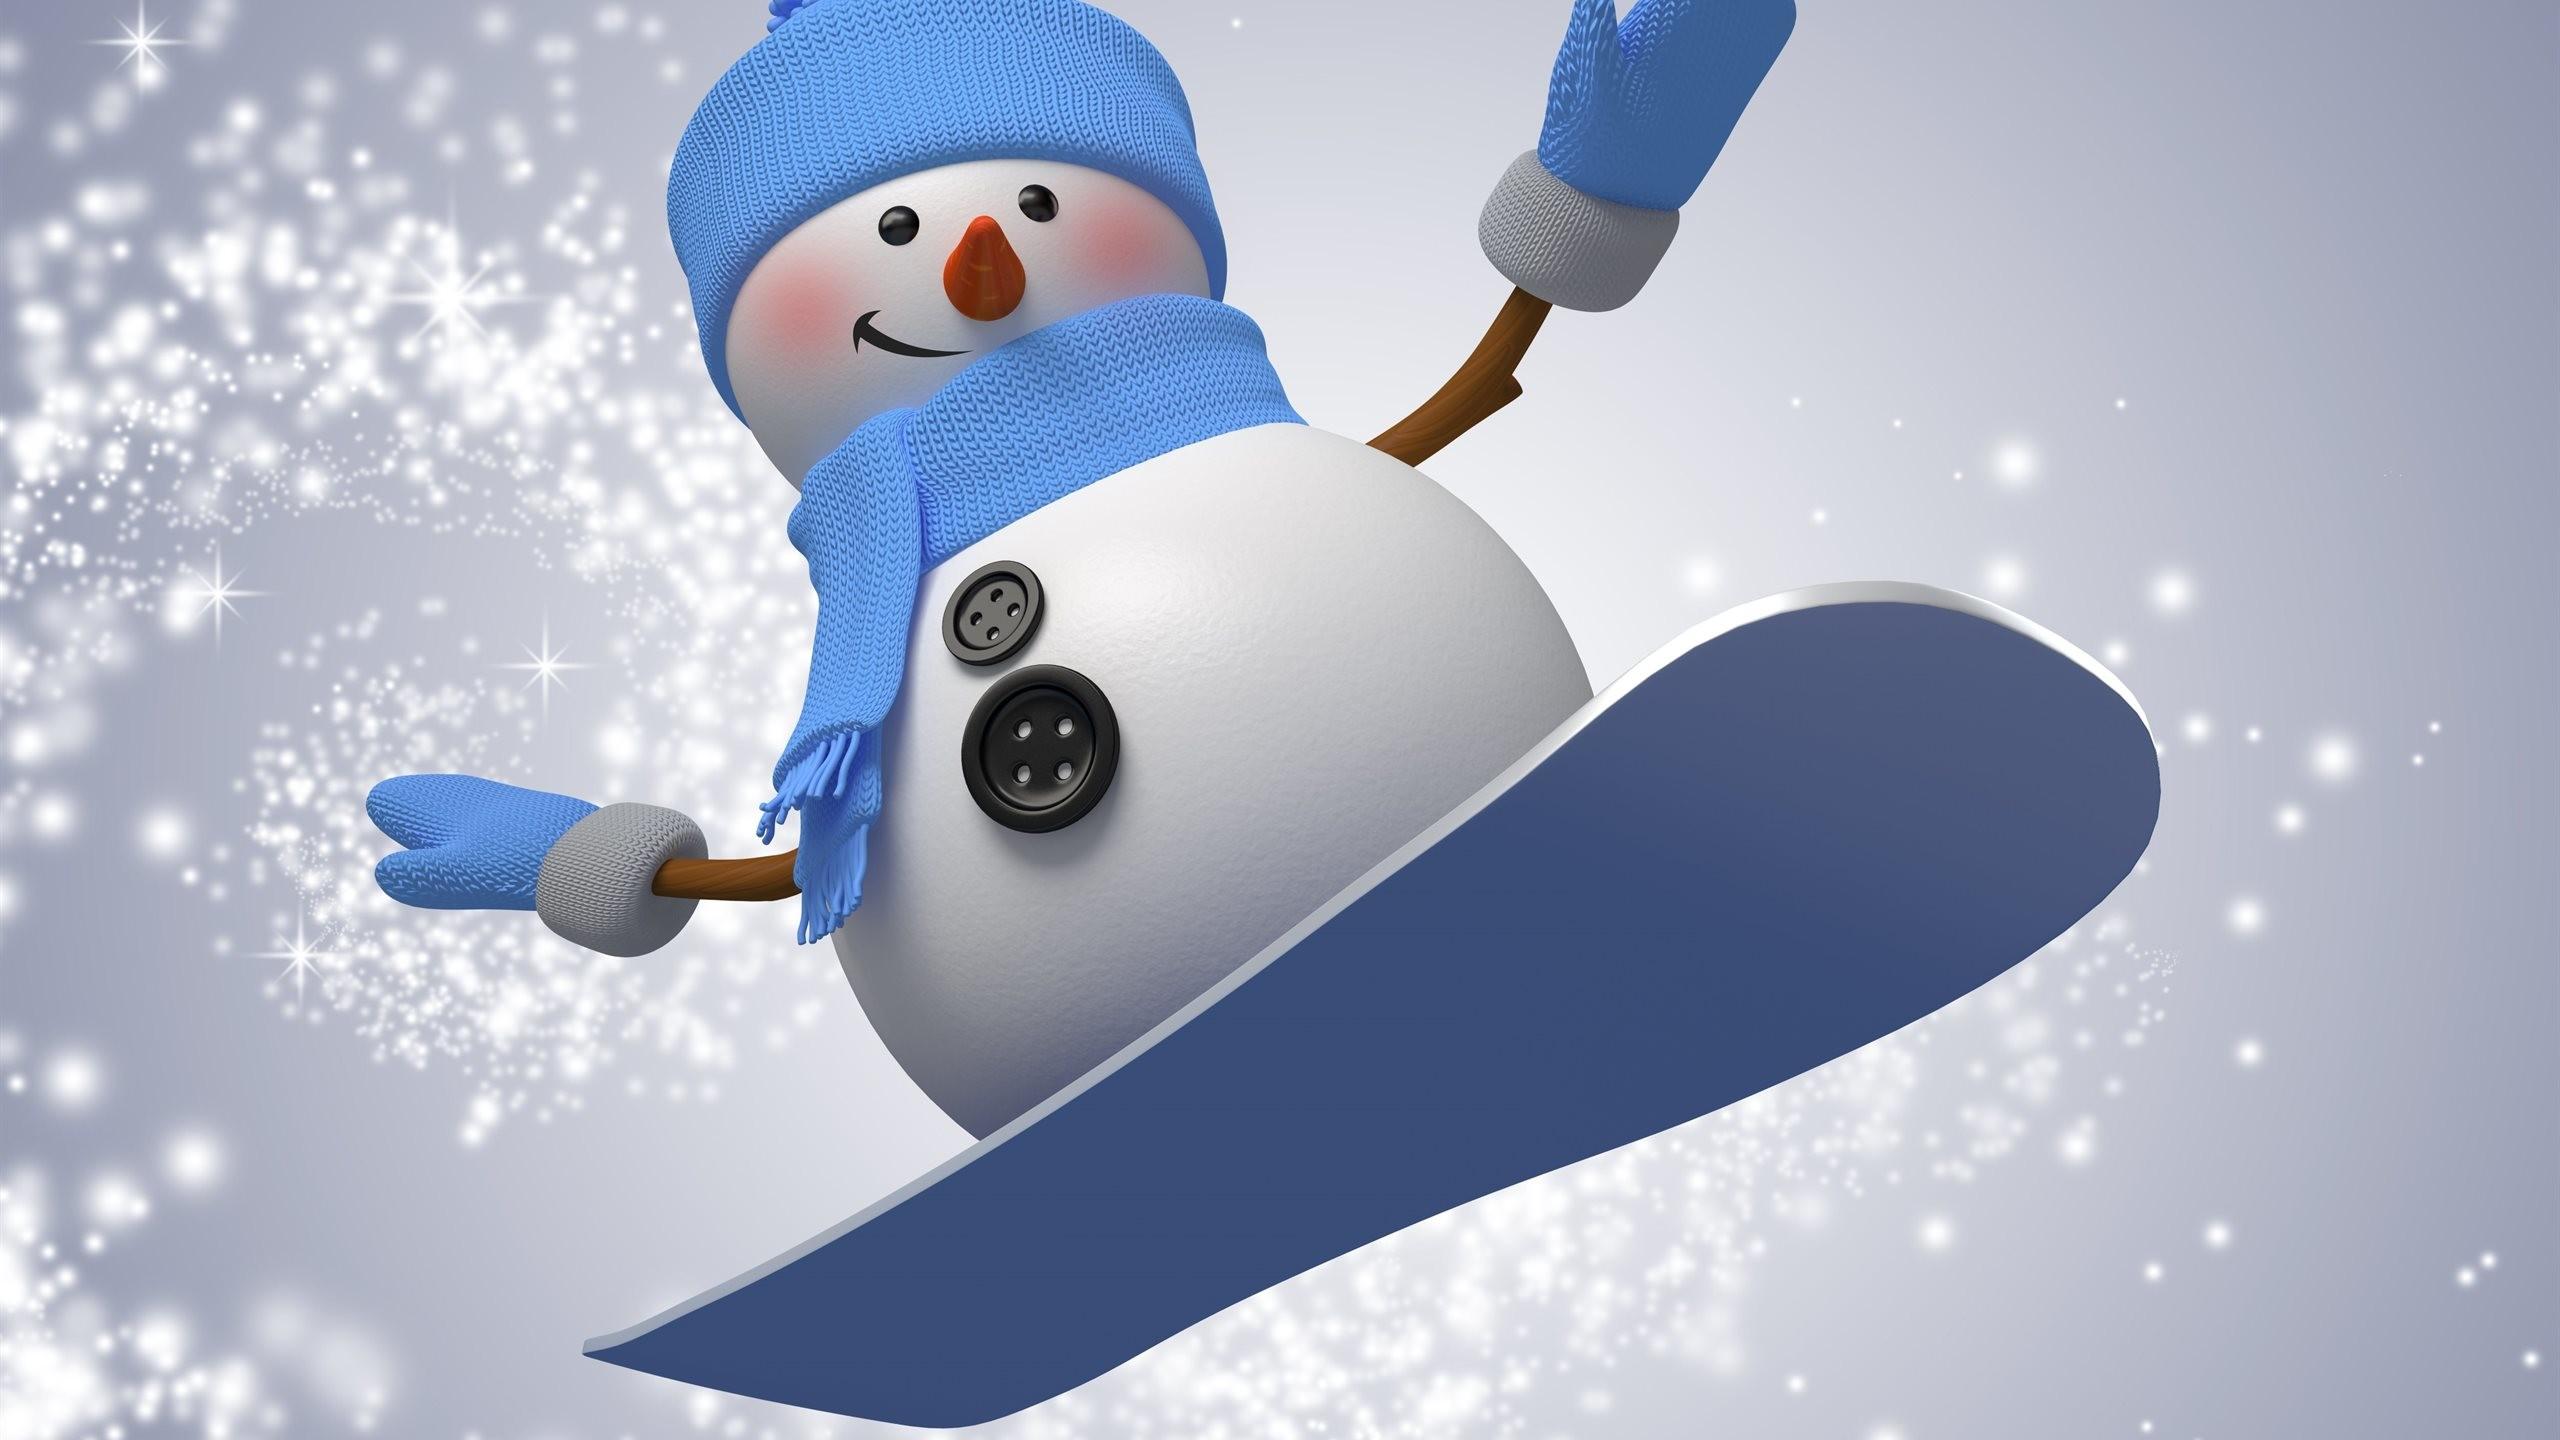 216 2162698 funny snowman wallpaper windows 10 backgrounds amazing cute